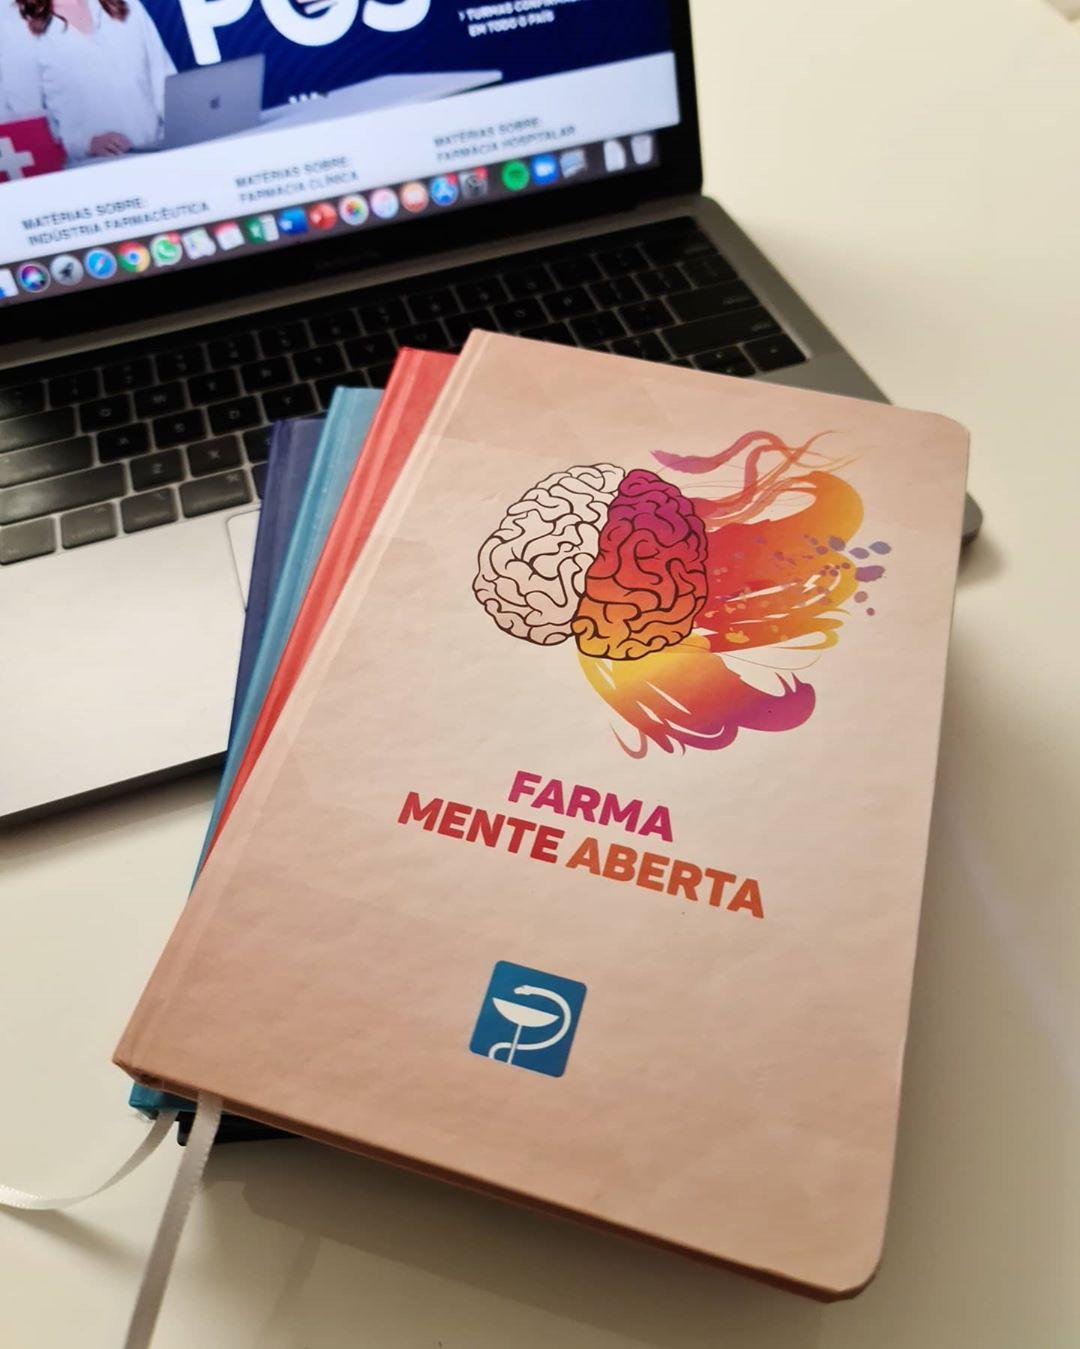 Caderneta Farma Mente Aberta